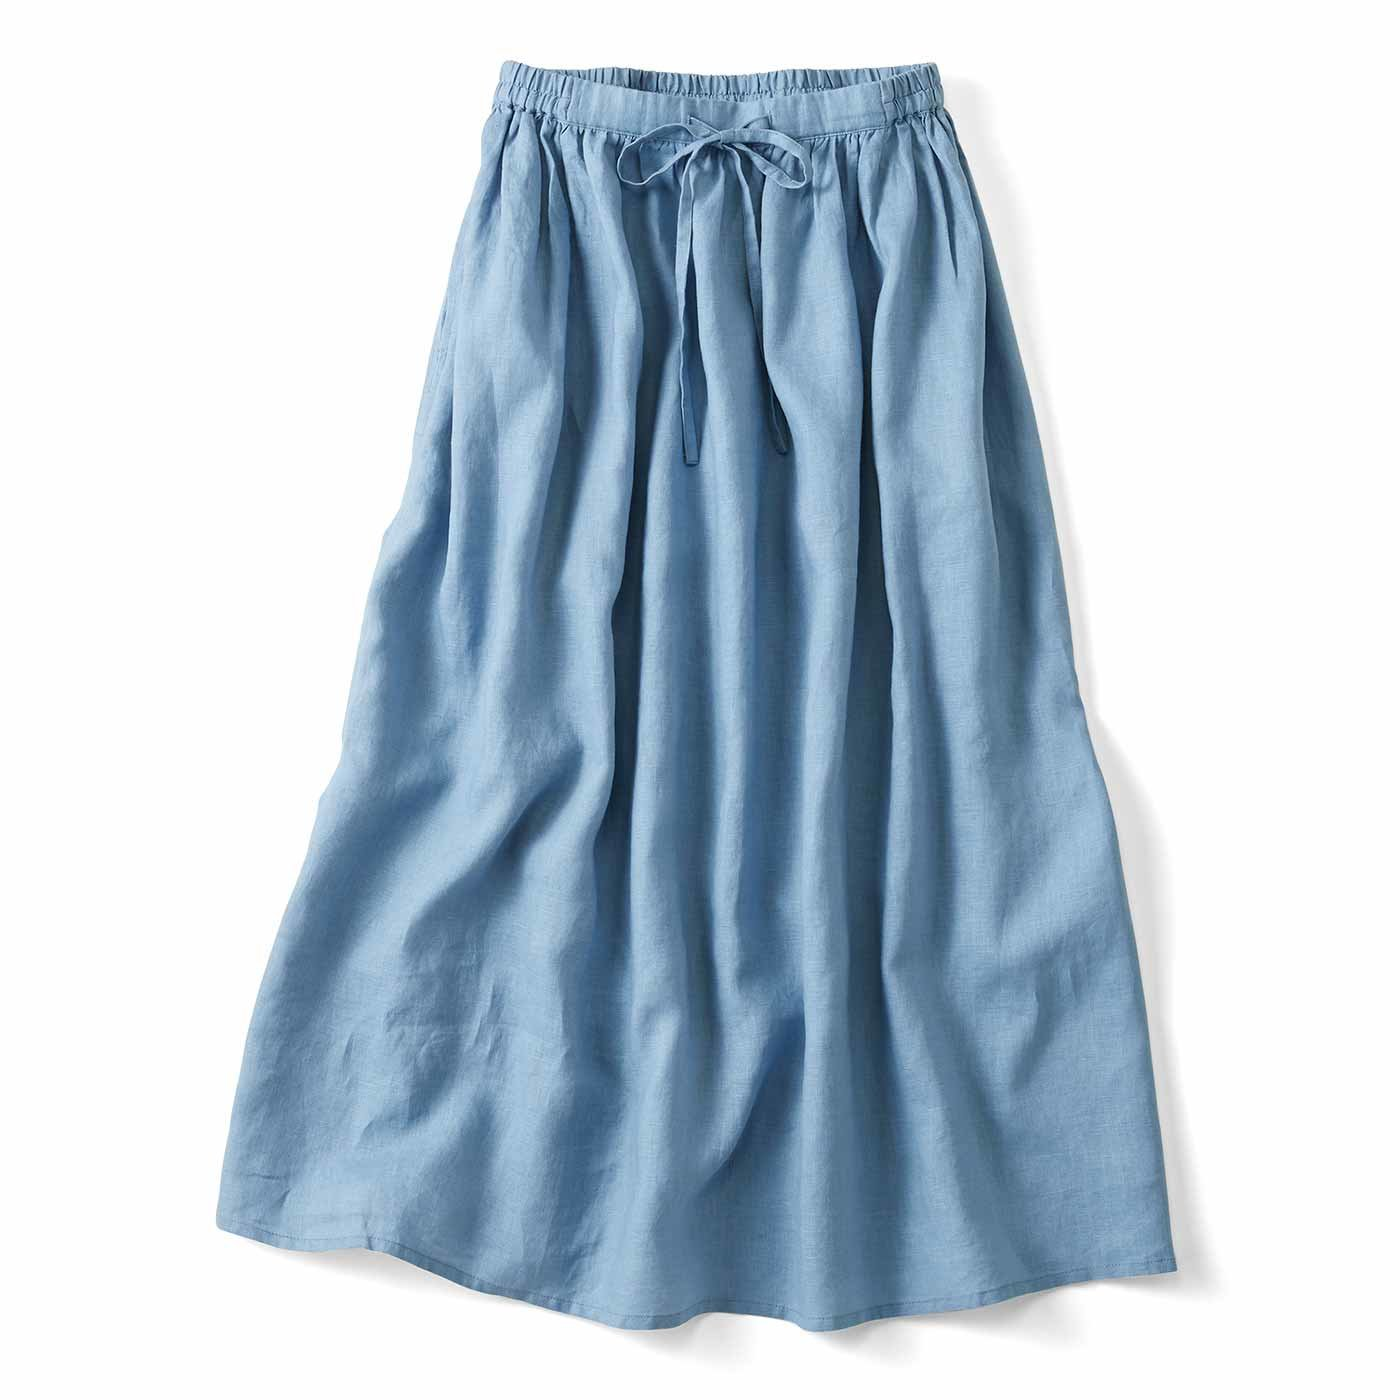 THREE FIFTY STANDARD 麻100%のたっぷりギャザーロングスカート〈ブルー〉